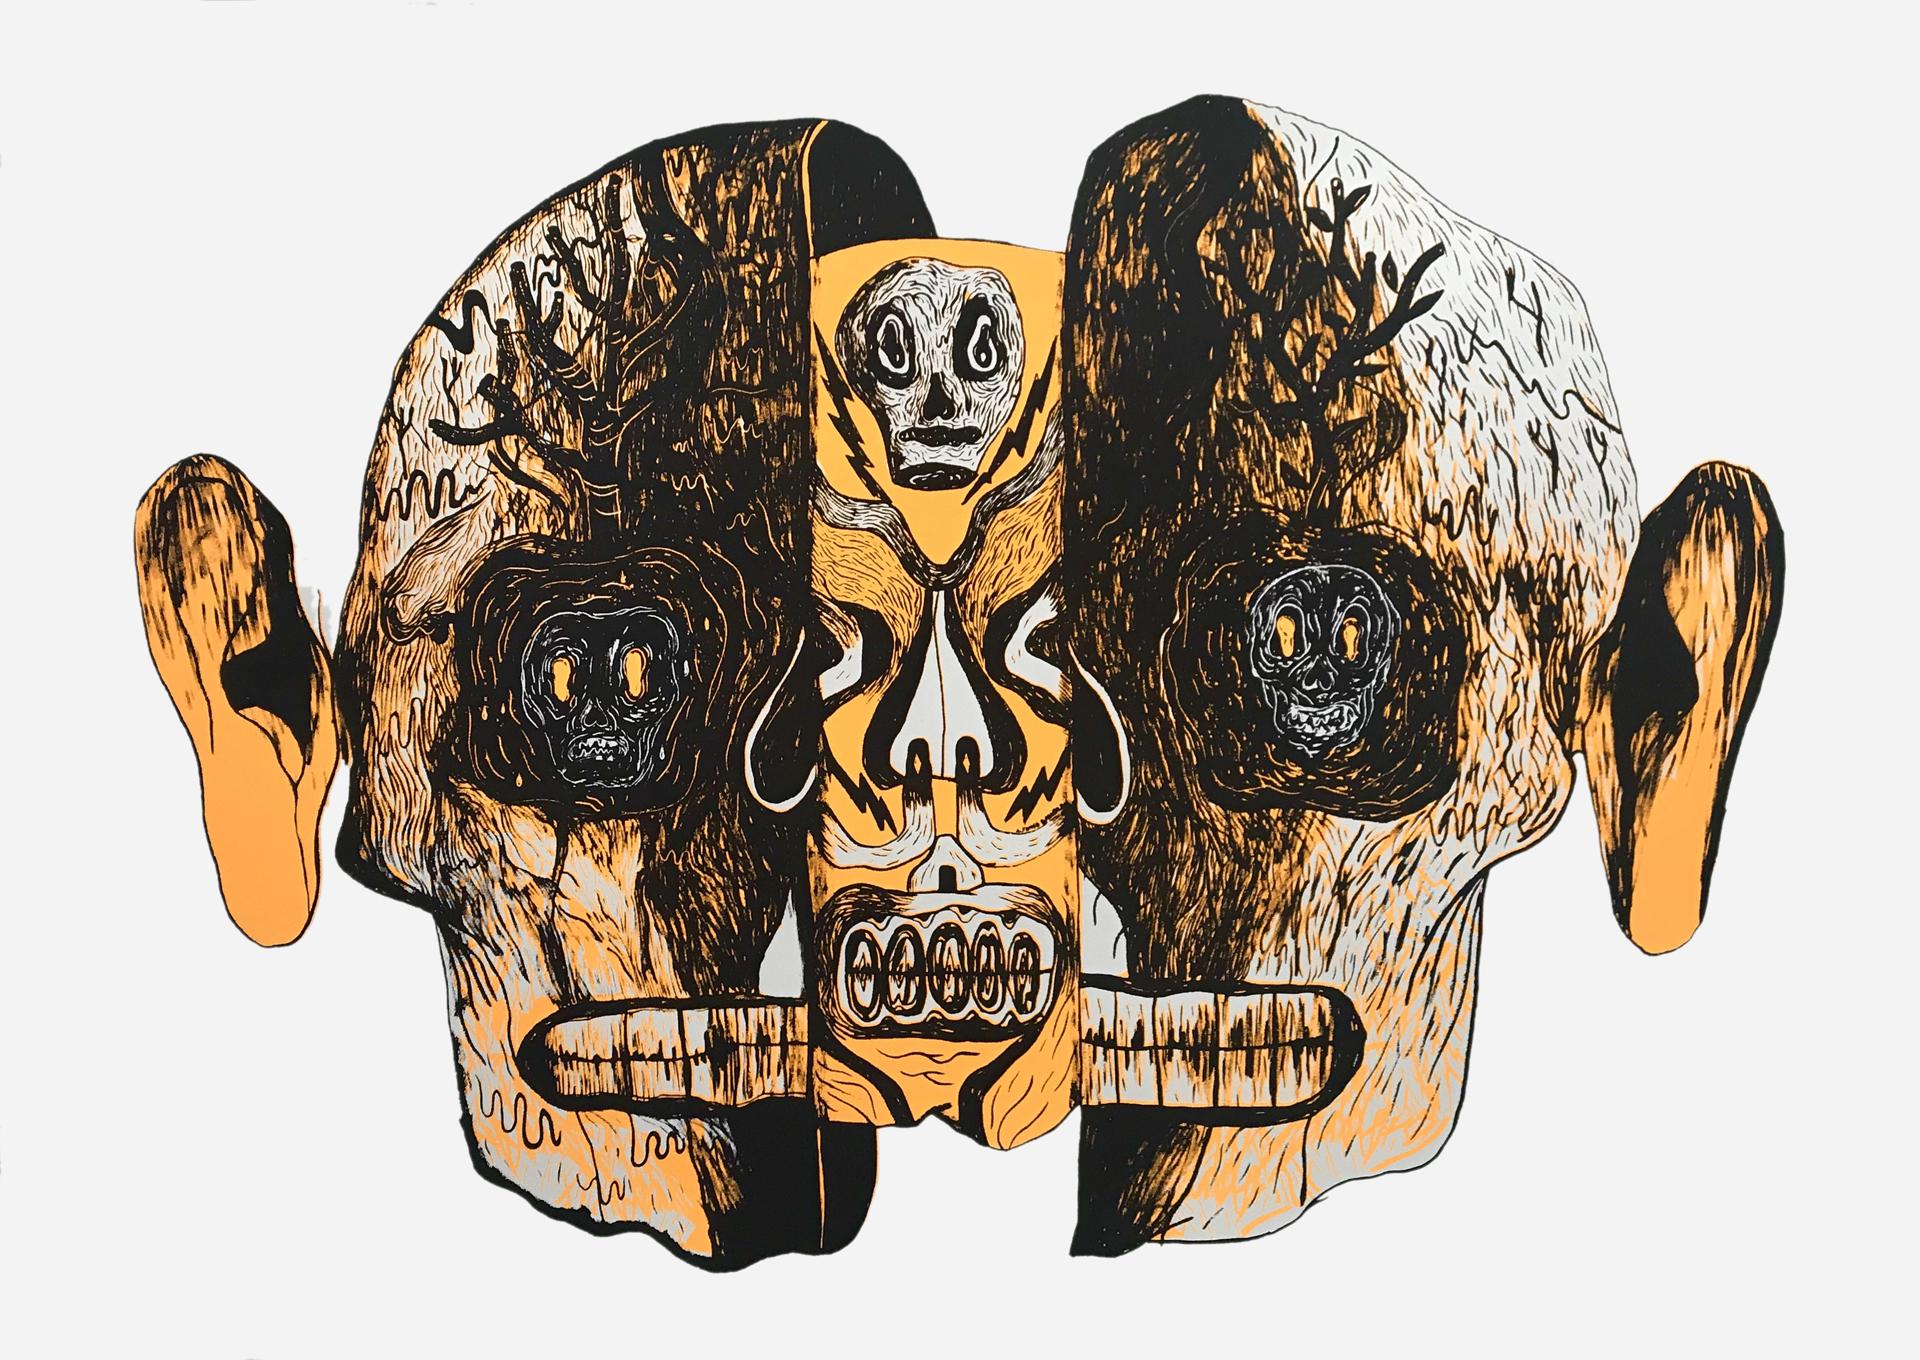 Máscara (Framed) by Alfonso Barrera